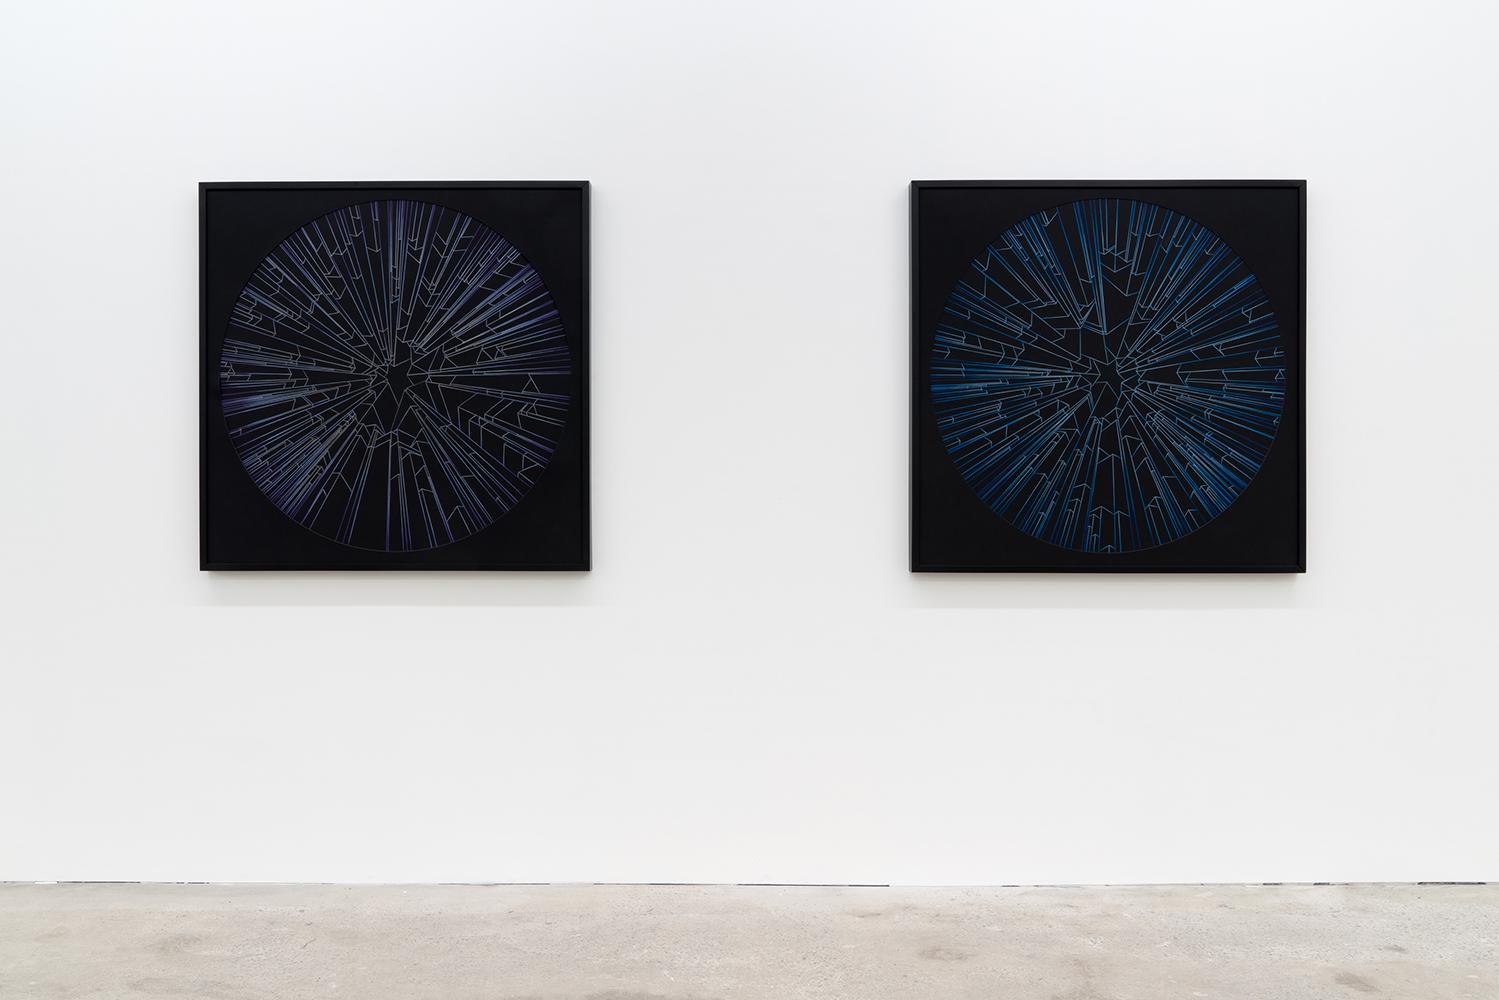 Ciel , 2019, vue d'exposition, Galerie Nicolas Robert, photo : Jean-Michael Seminaro